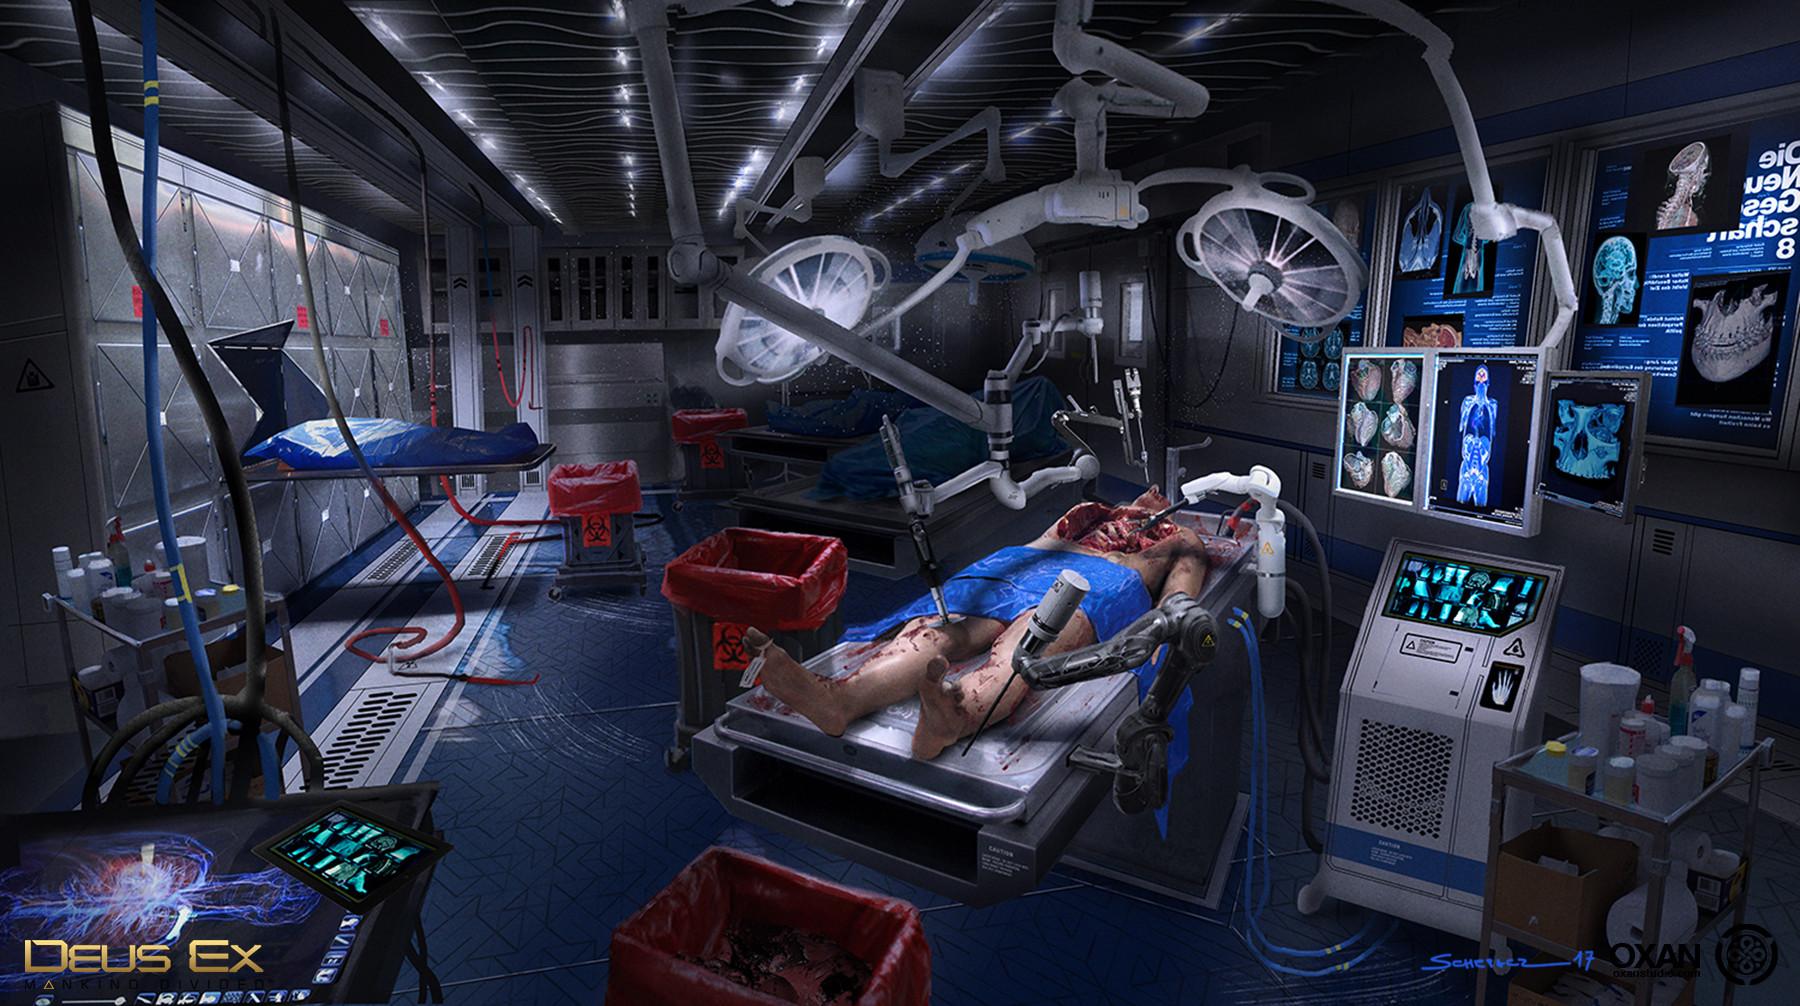 Yohann schepacz oxan studio morgue concept01 wip05